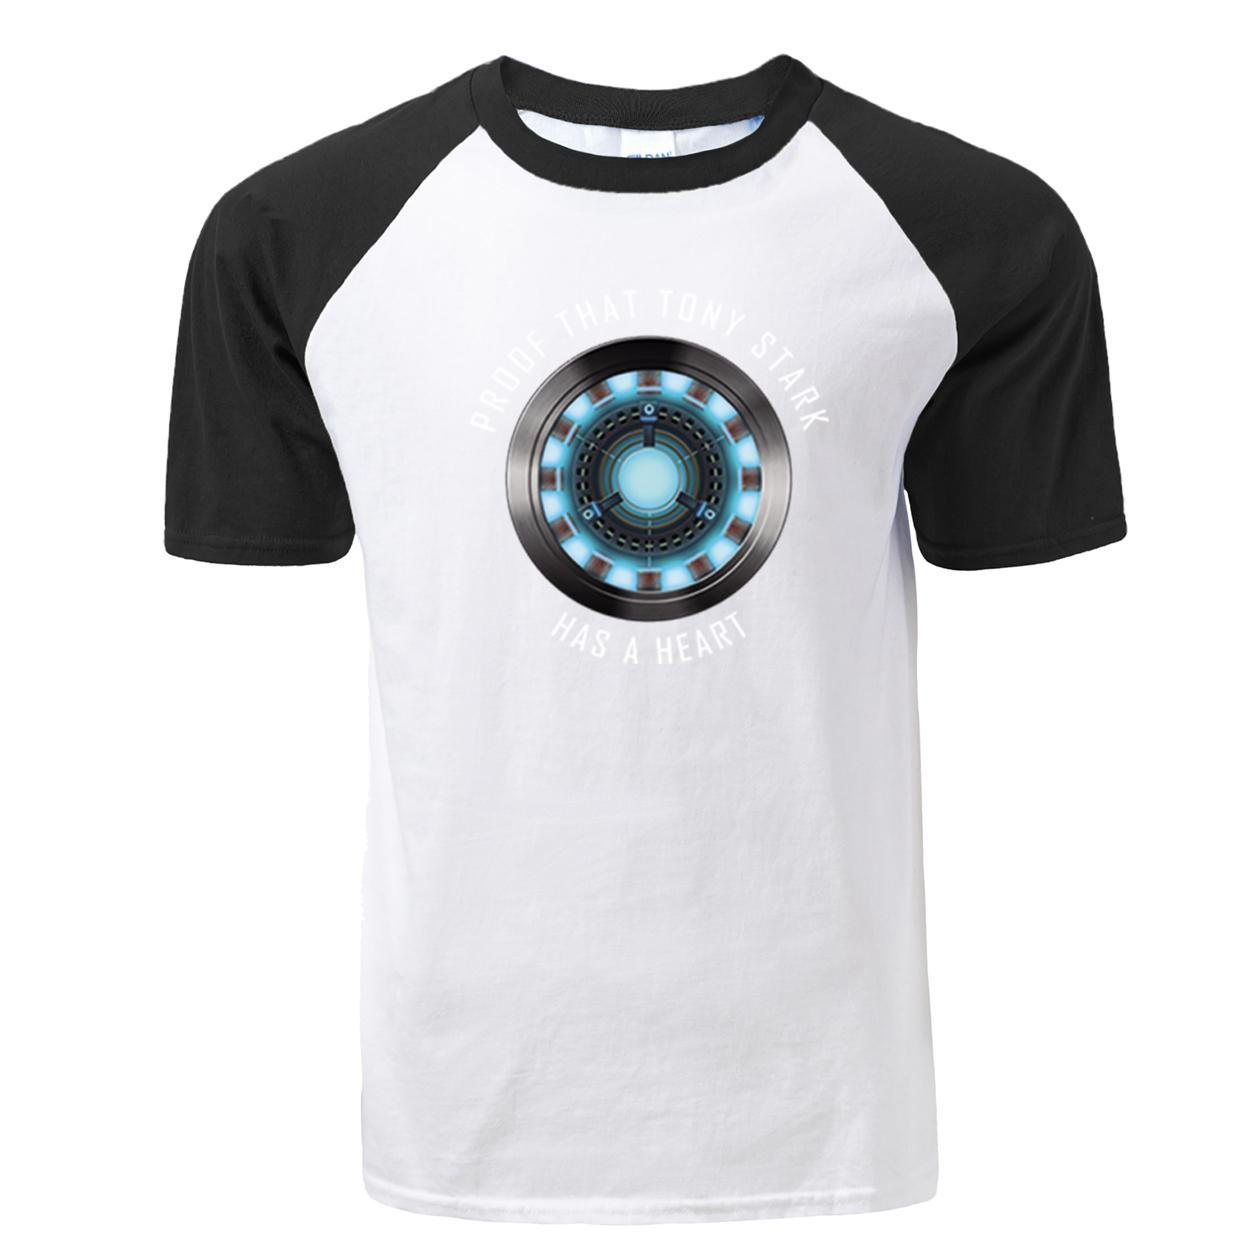 T-Shirt Männer 2020 beiläufige Art und Weise Lustige Katze im Taschen-Entwurf Raglan T-Shirt Männer-T-Shirt Tier-Grafiken gedruckt Tops Hipster-T-Shirts